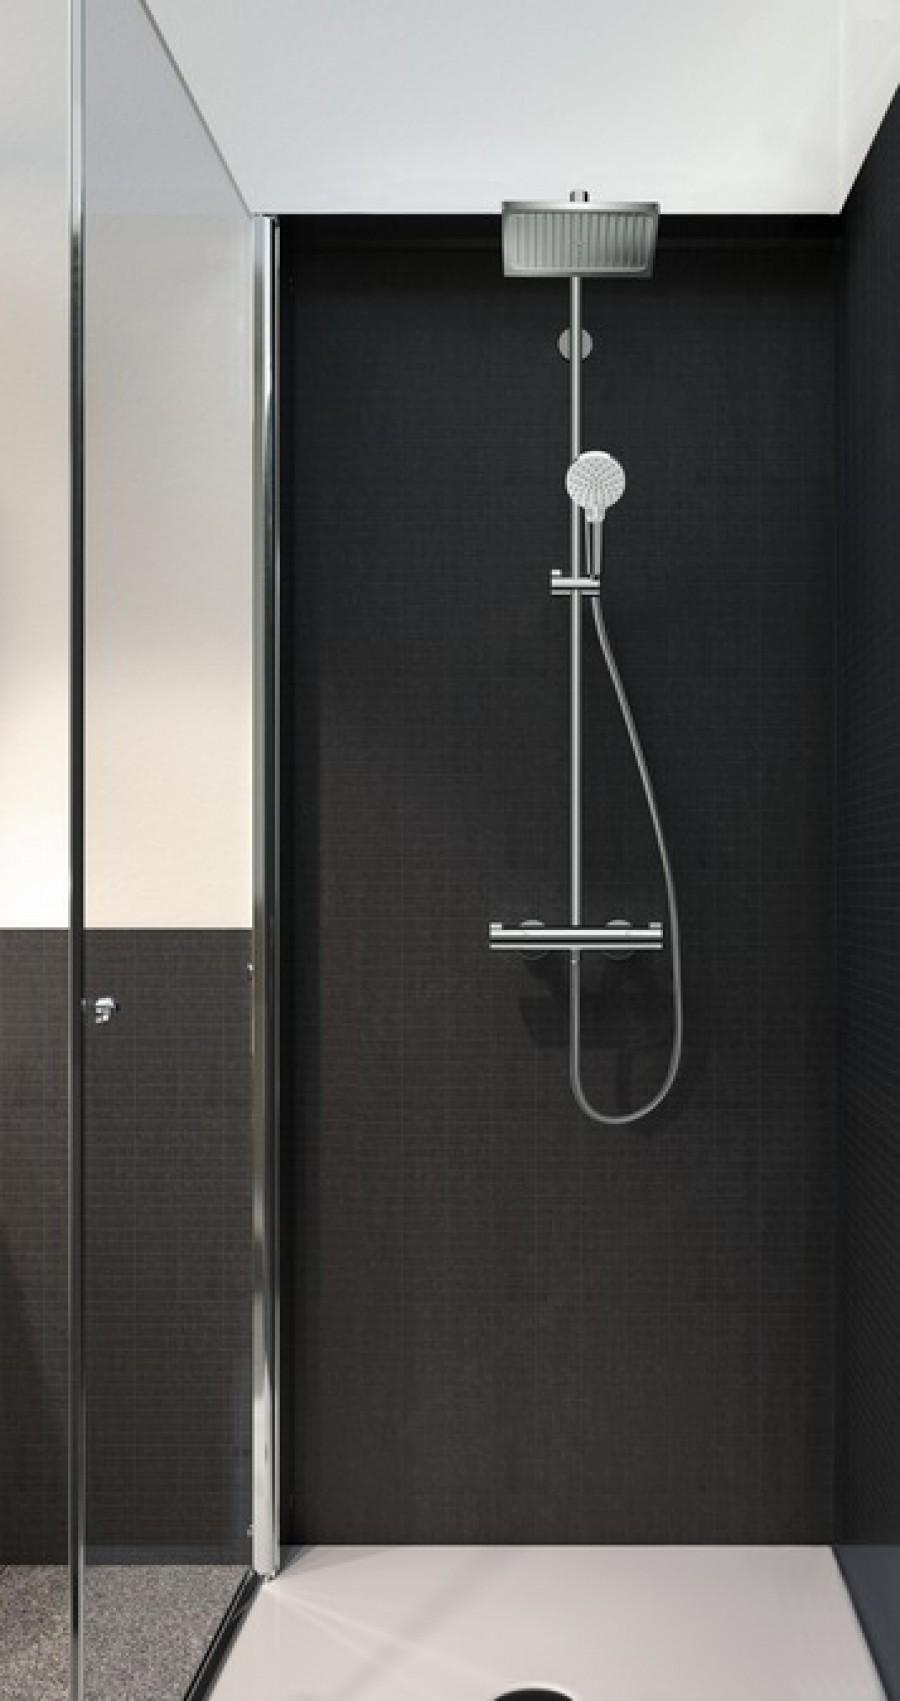 colonne de douche showerpipe crometta e 240 1jet 27271000. Black Bedroom Furniture Sets. Home Design Ideas